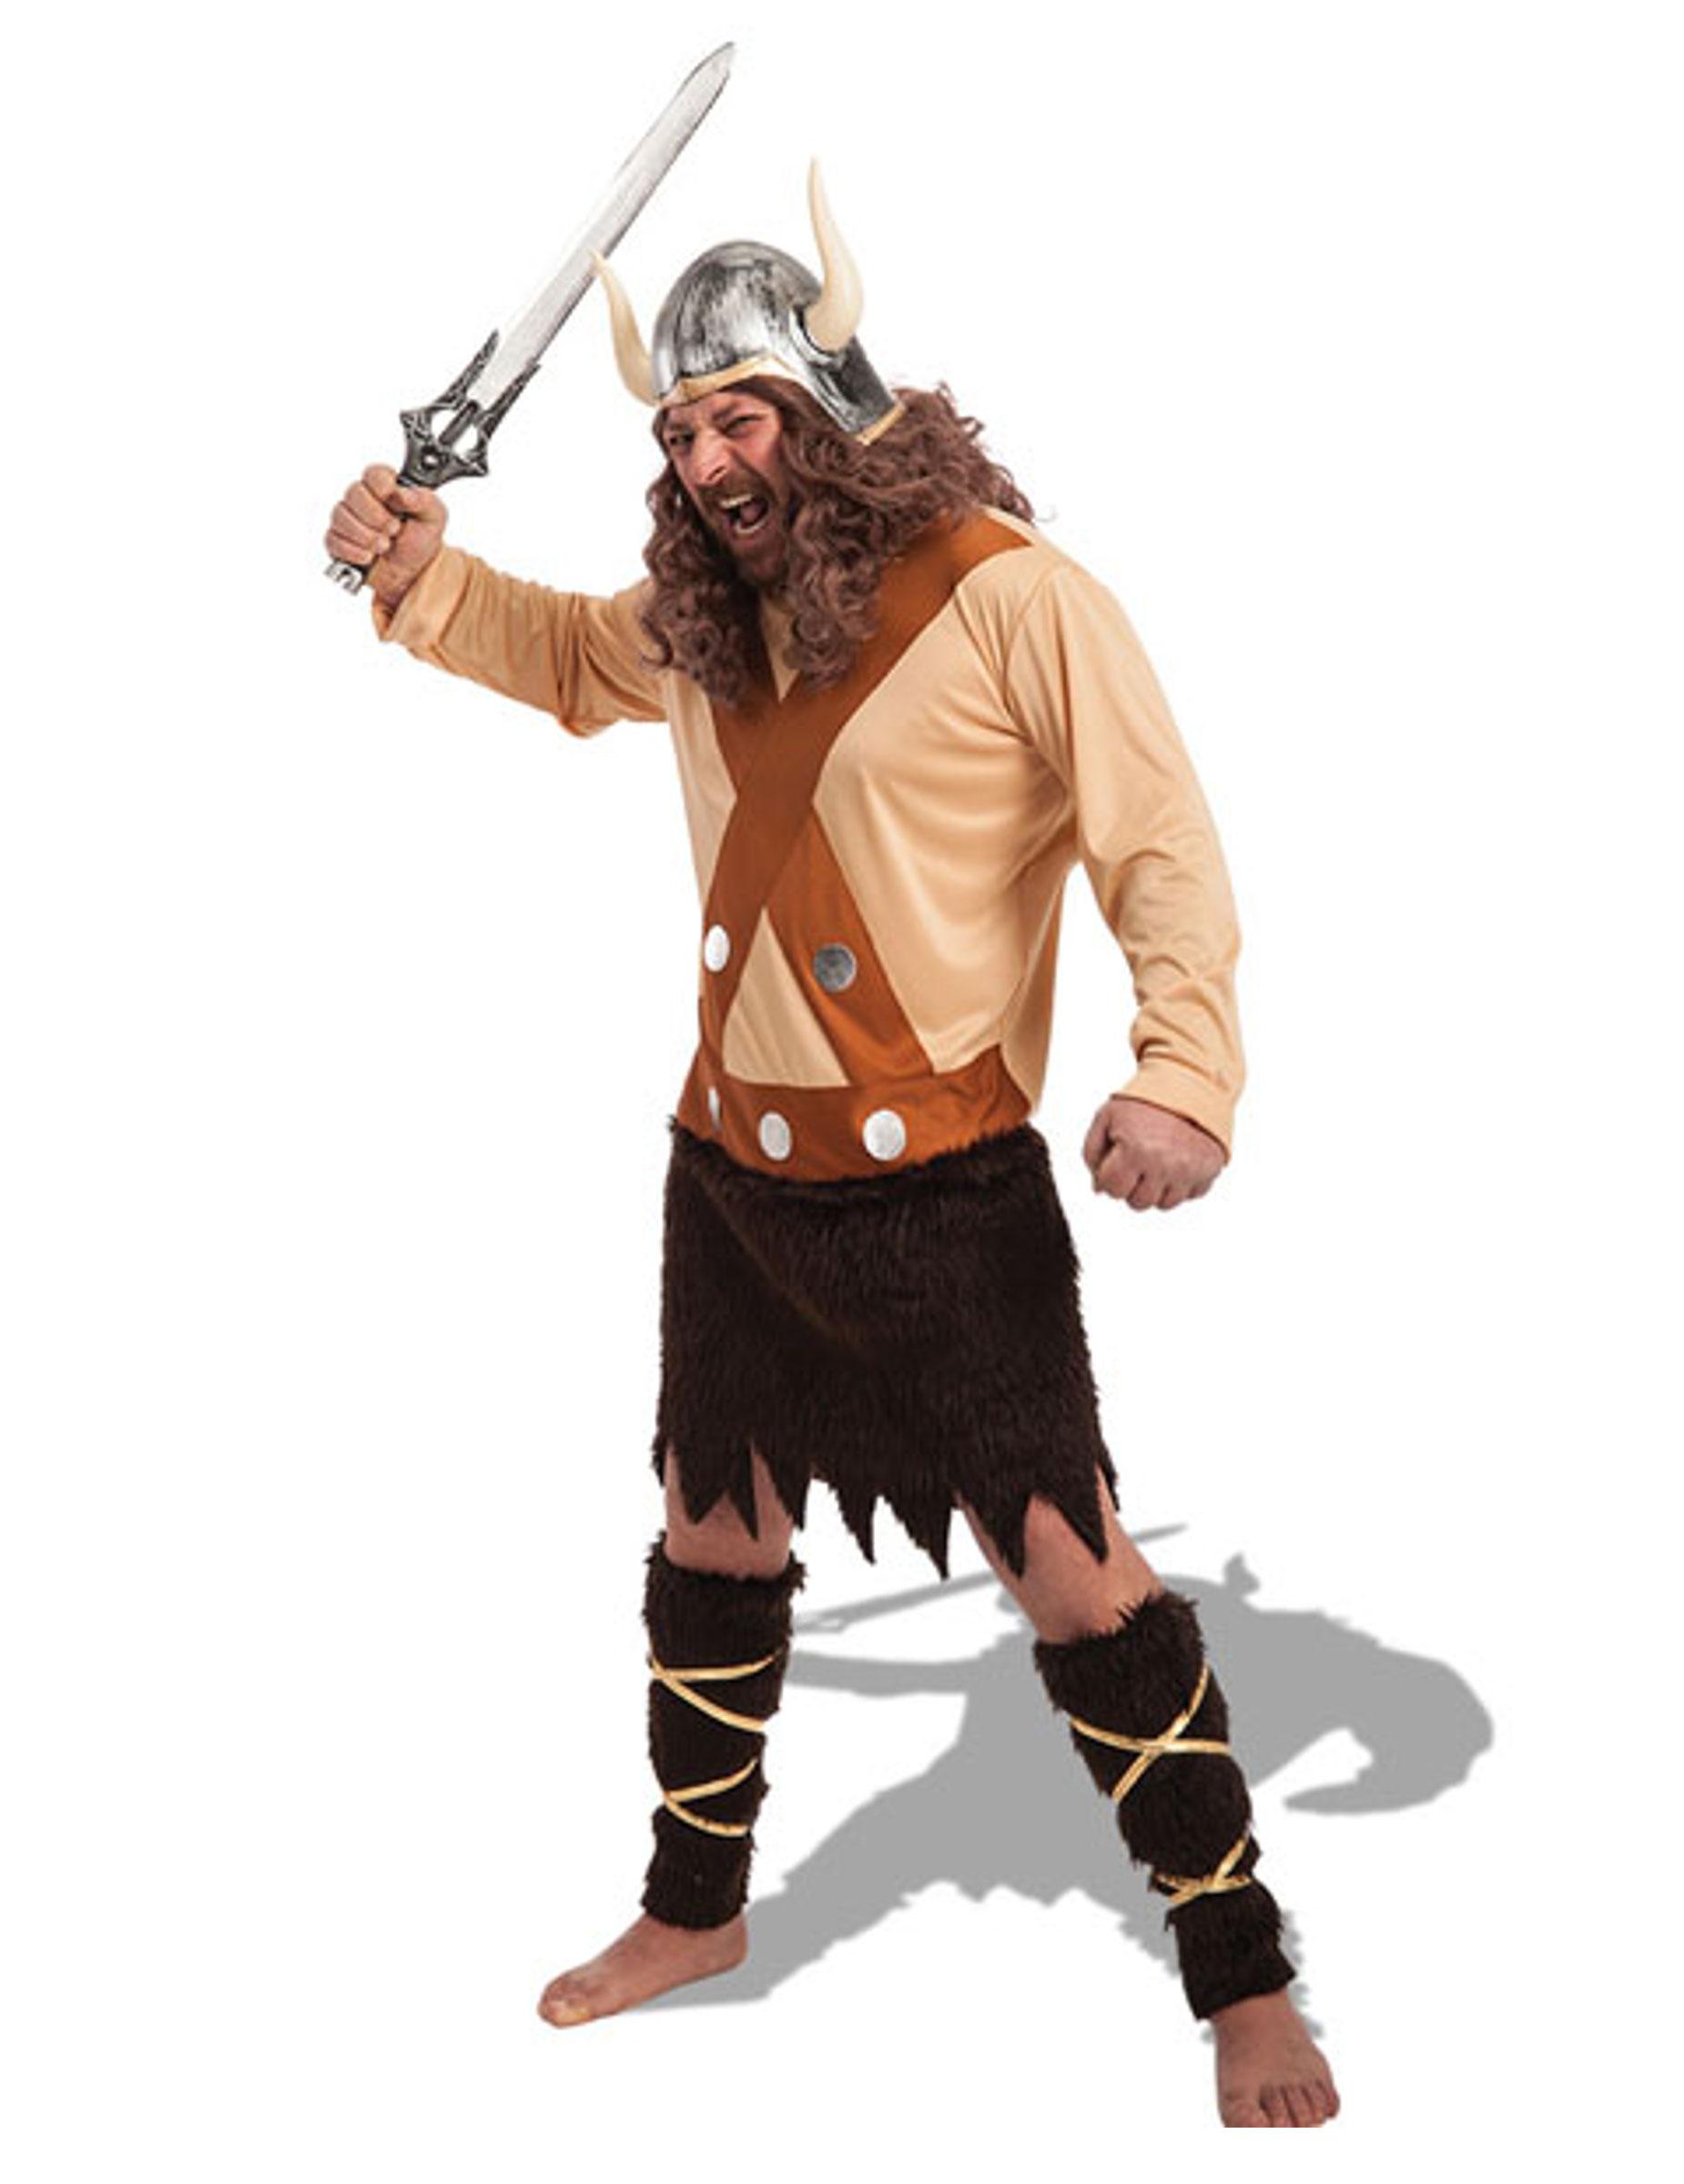 c5bccec51fad51 deguisement viking homme